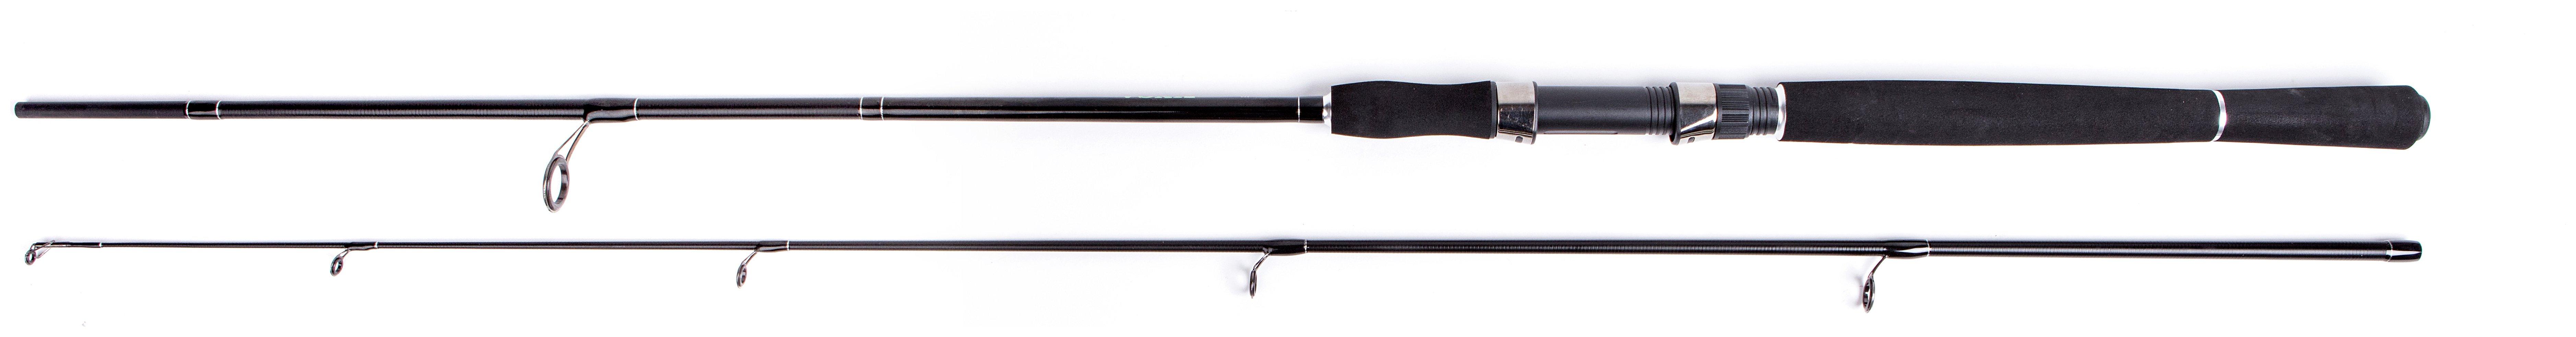 Matt Hayes Adventure 3.6 Metre Fishing Rod